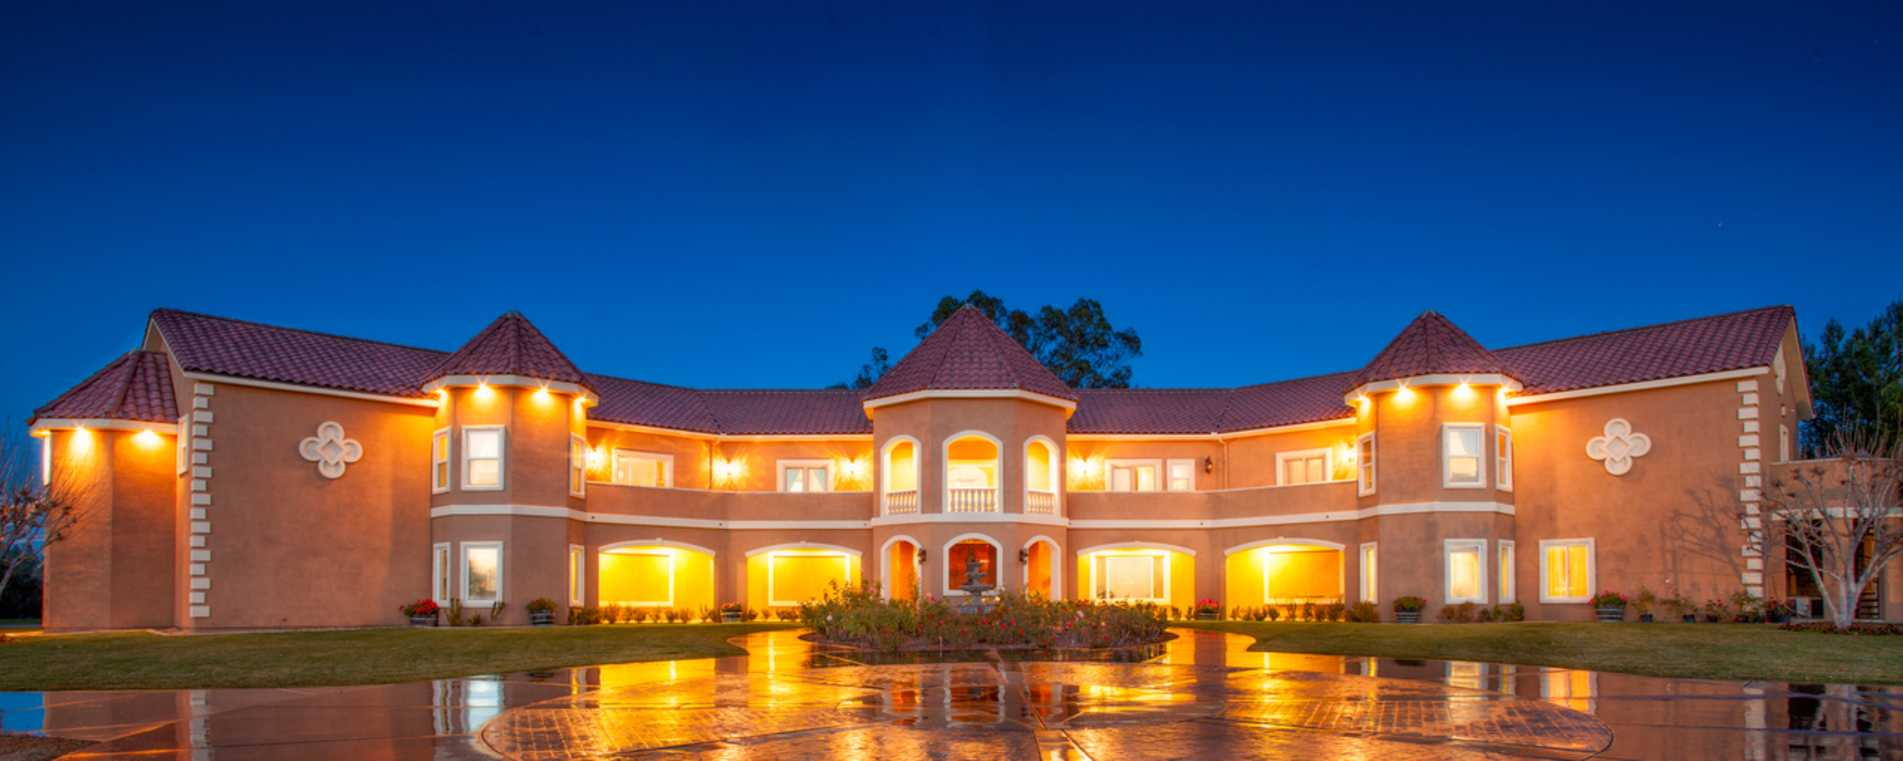 Wilson Creek Manor - Temecula